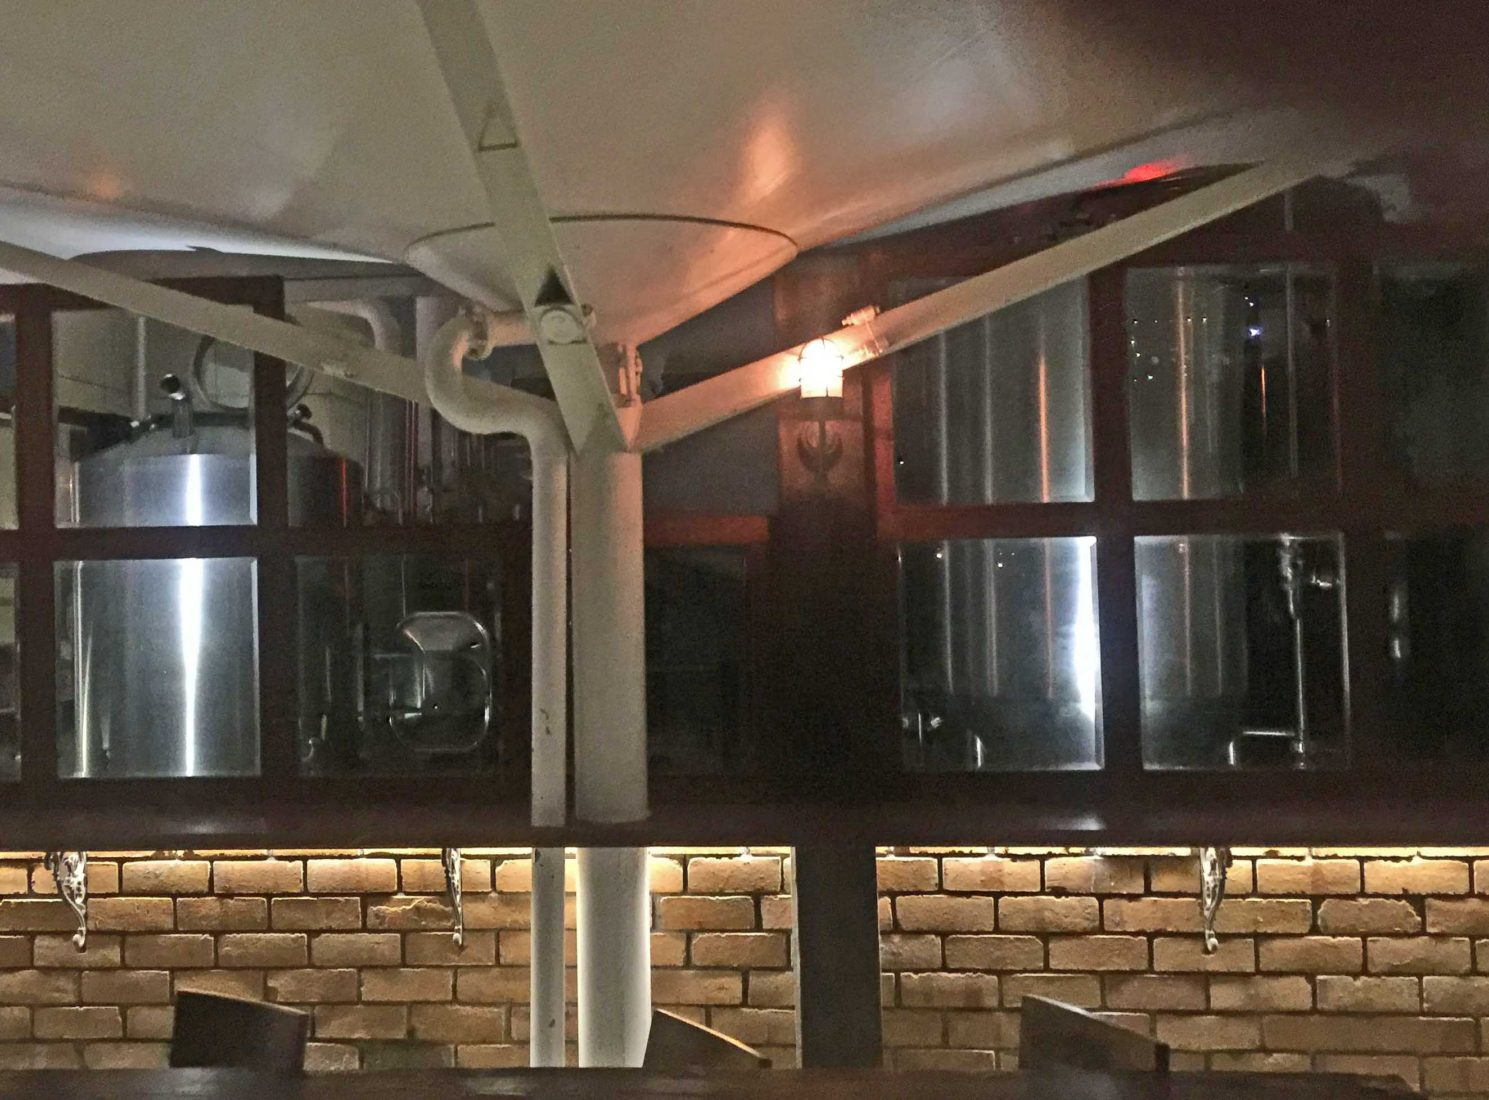 256. Bangalore Brewing Company, Bangalore India, 2015